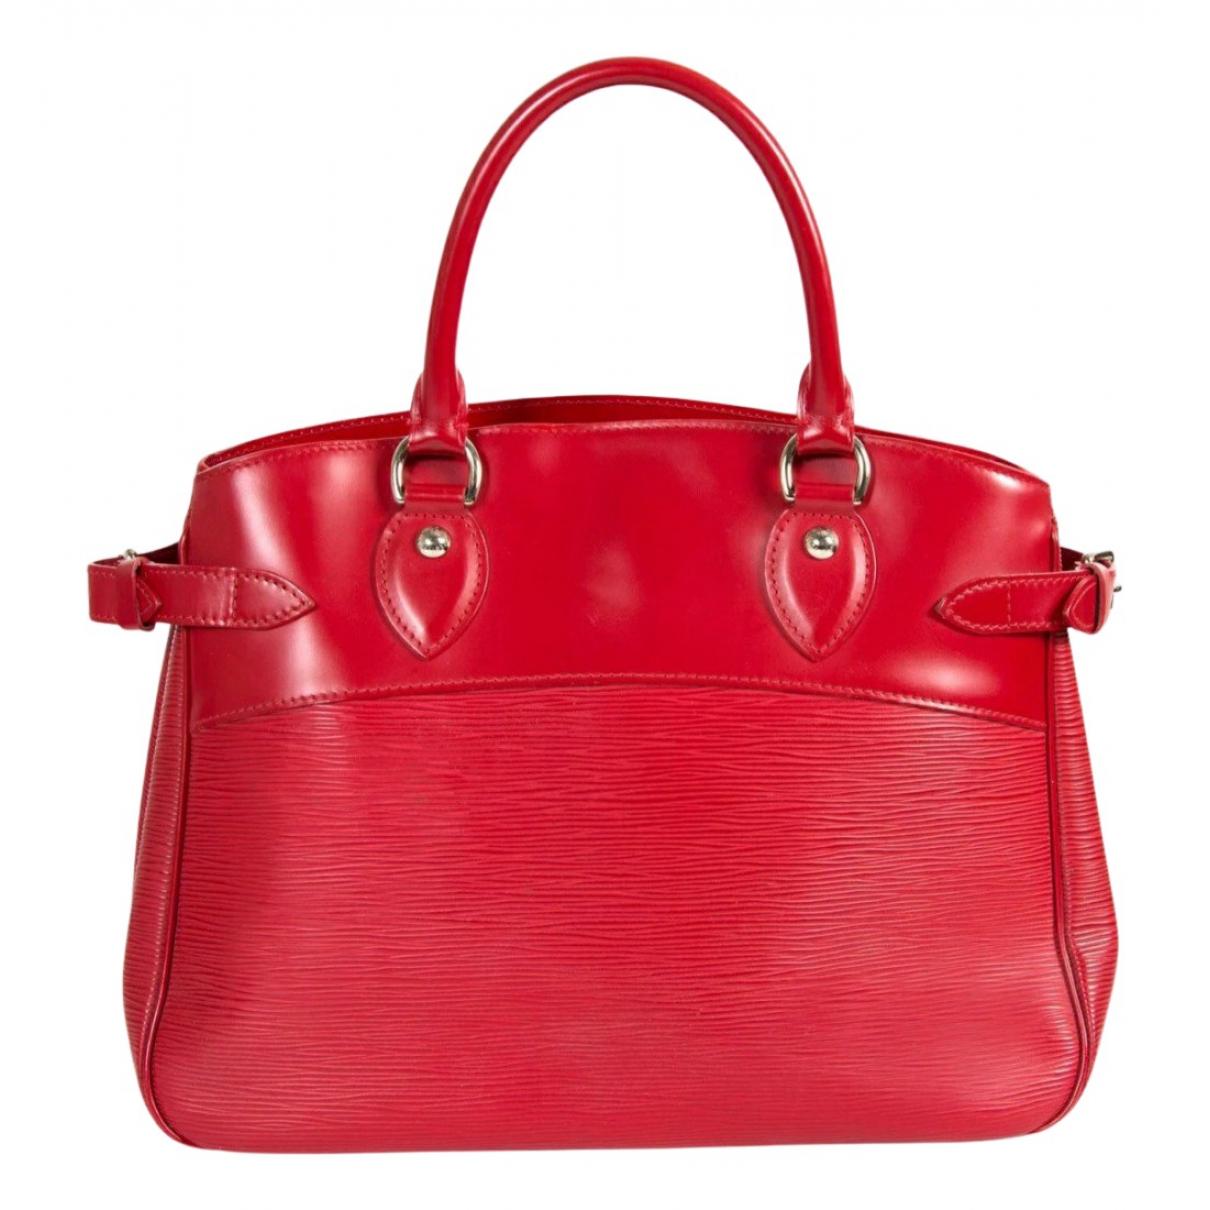 Louis Vuitton Passy Handtasche in  Rot Leder